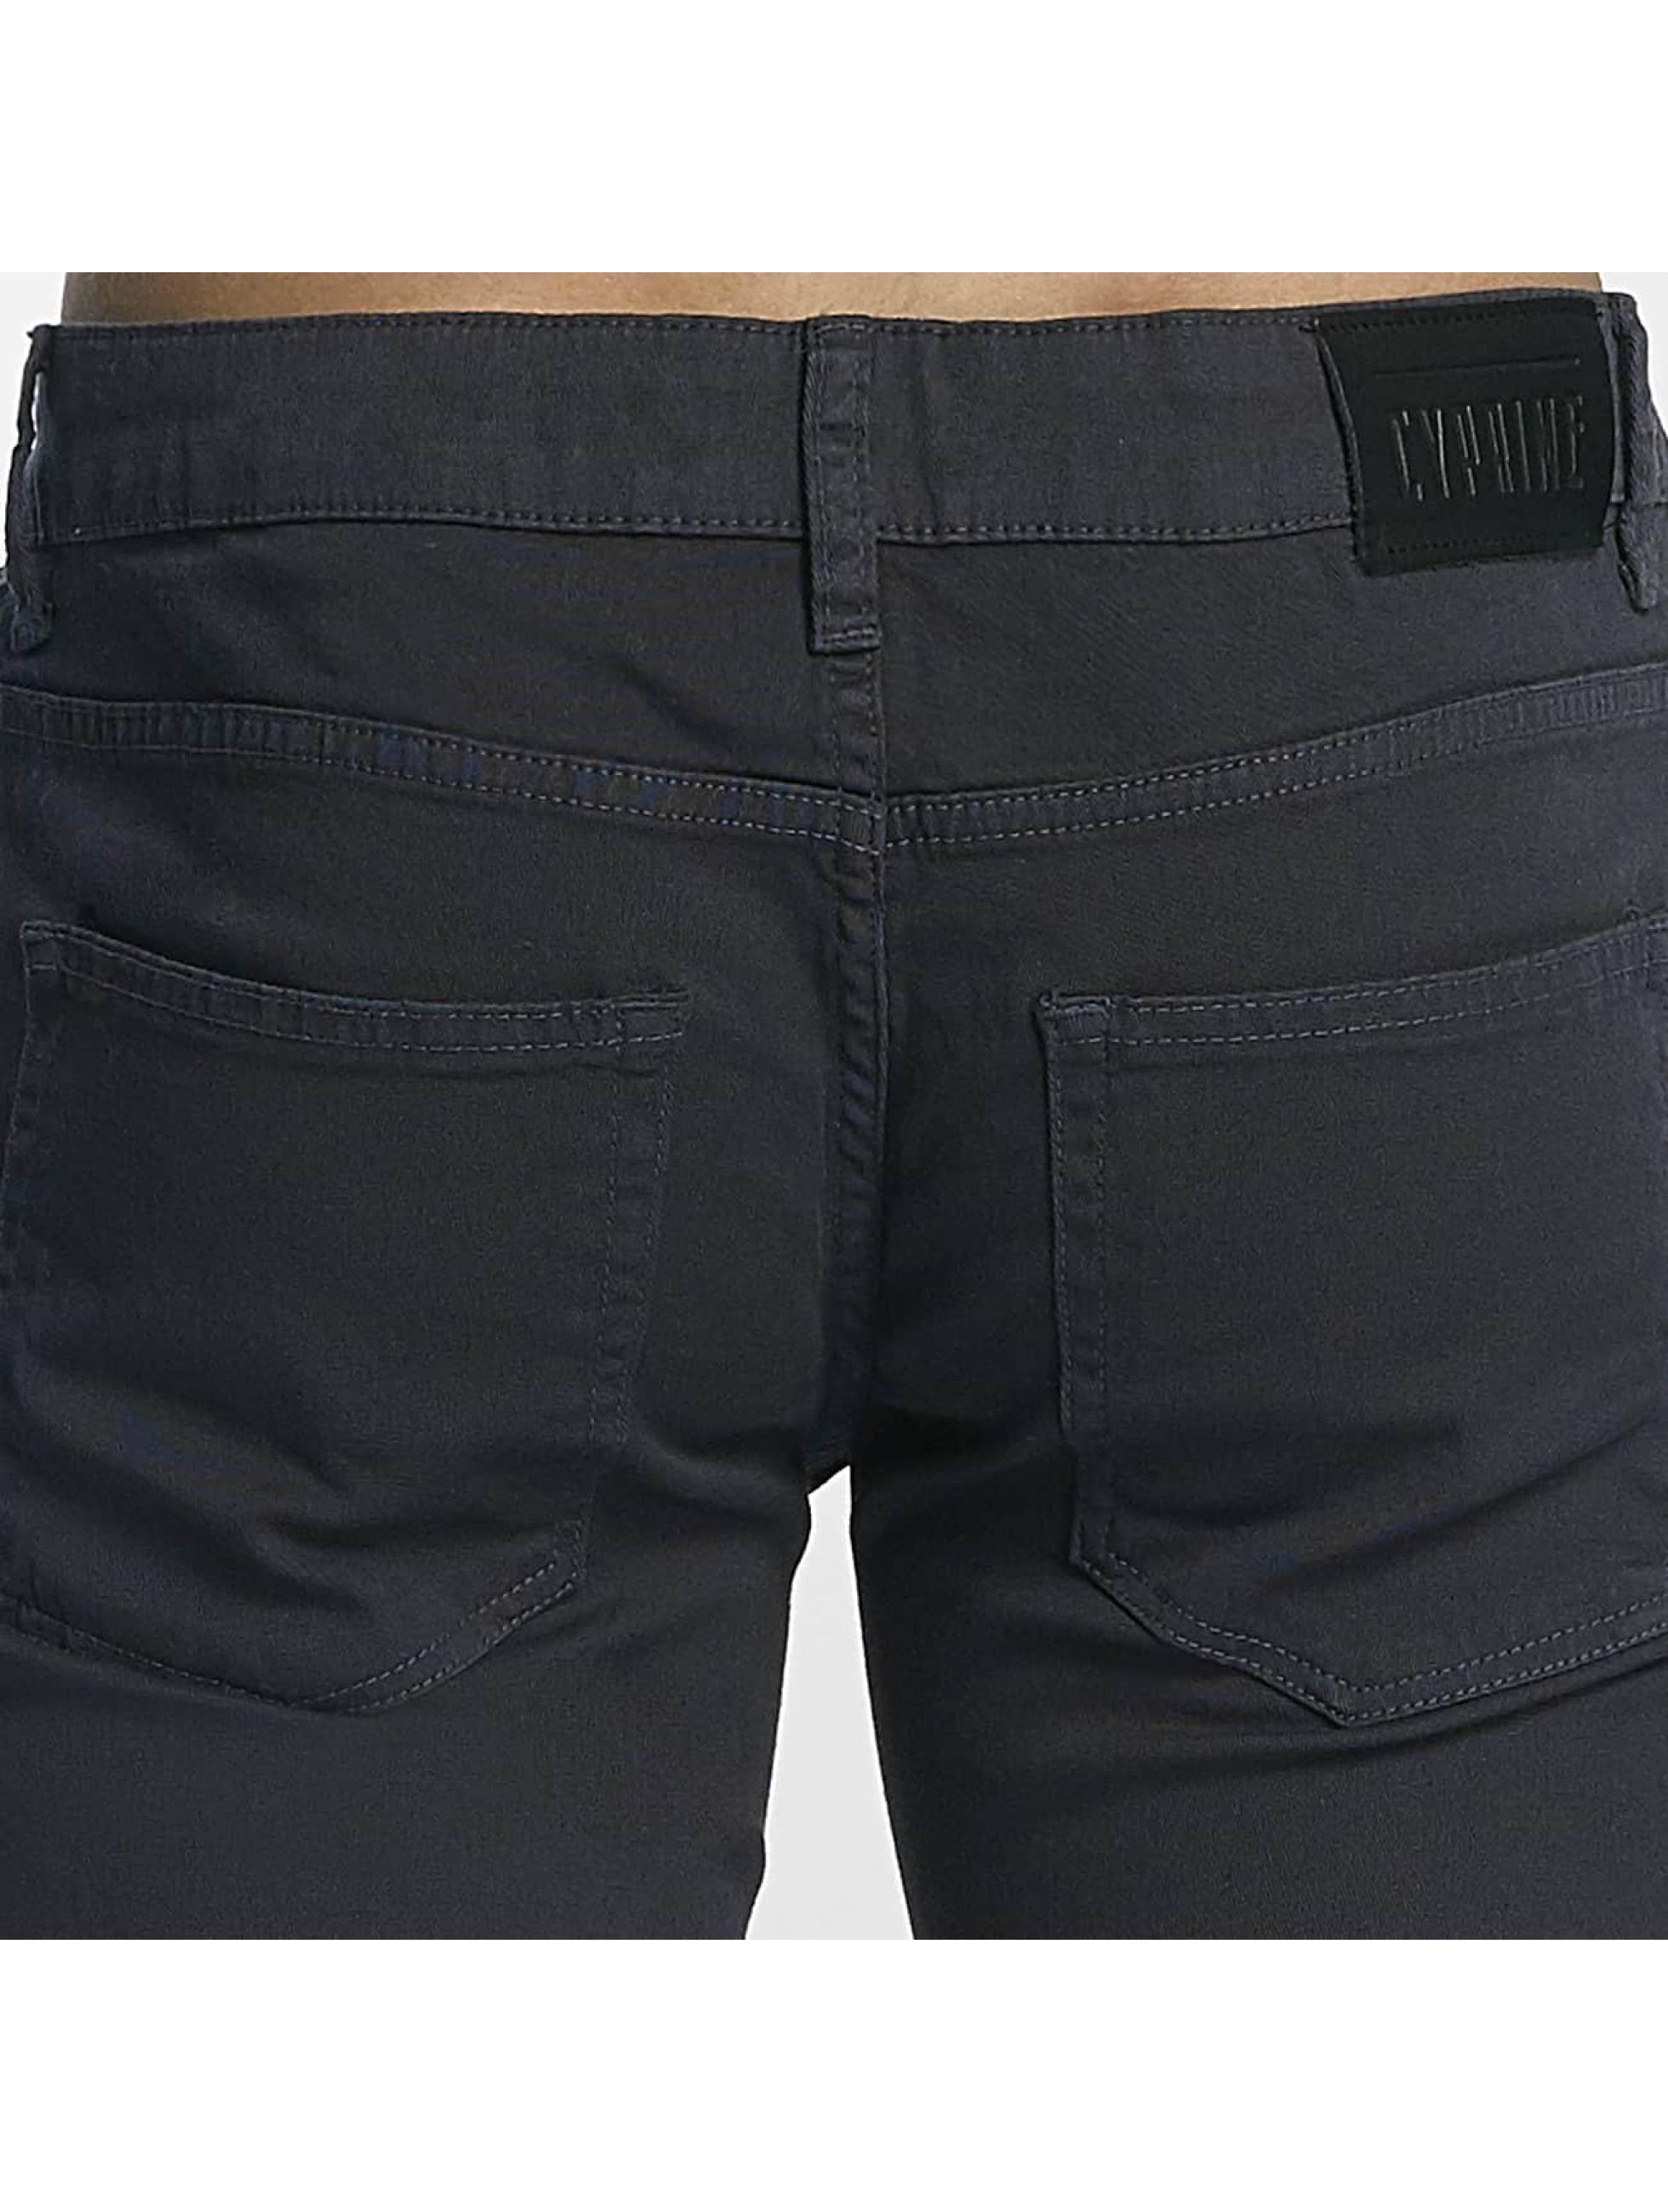 Cyprime Slim Fit Jeans Keylam grey